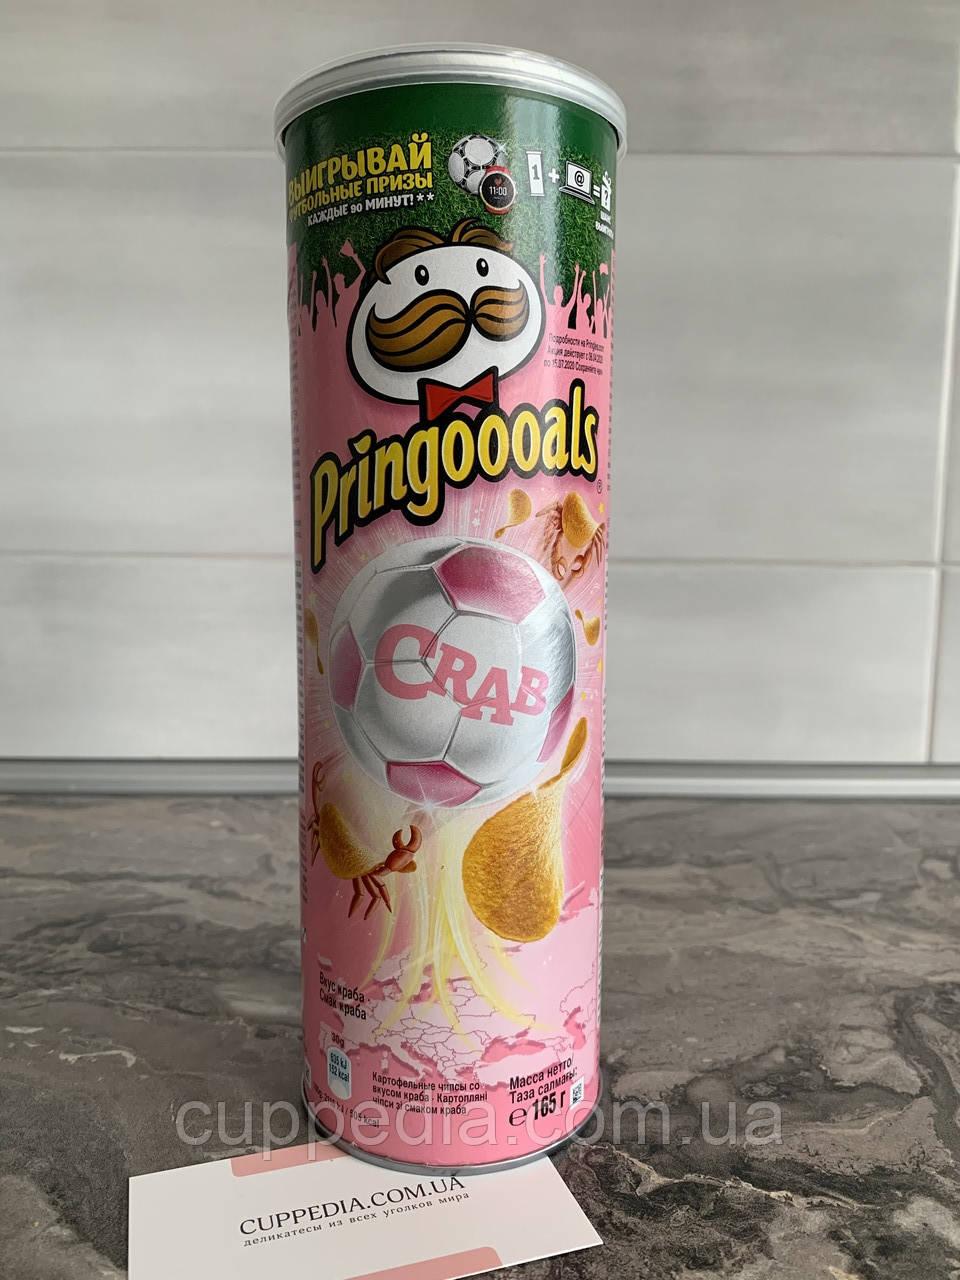 Чипсы Pringles Crab со вкусом краба 165 грм